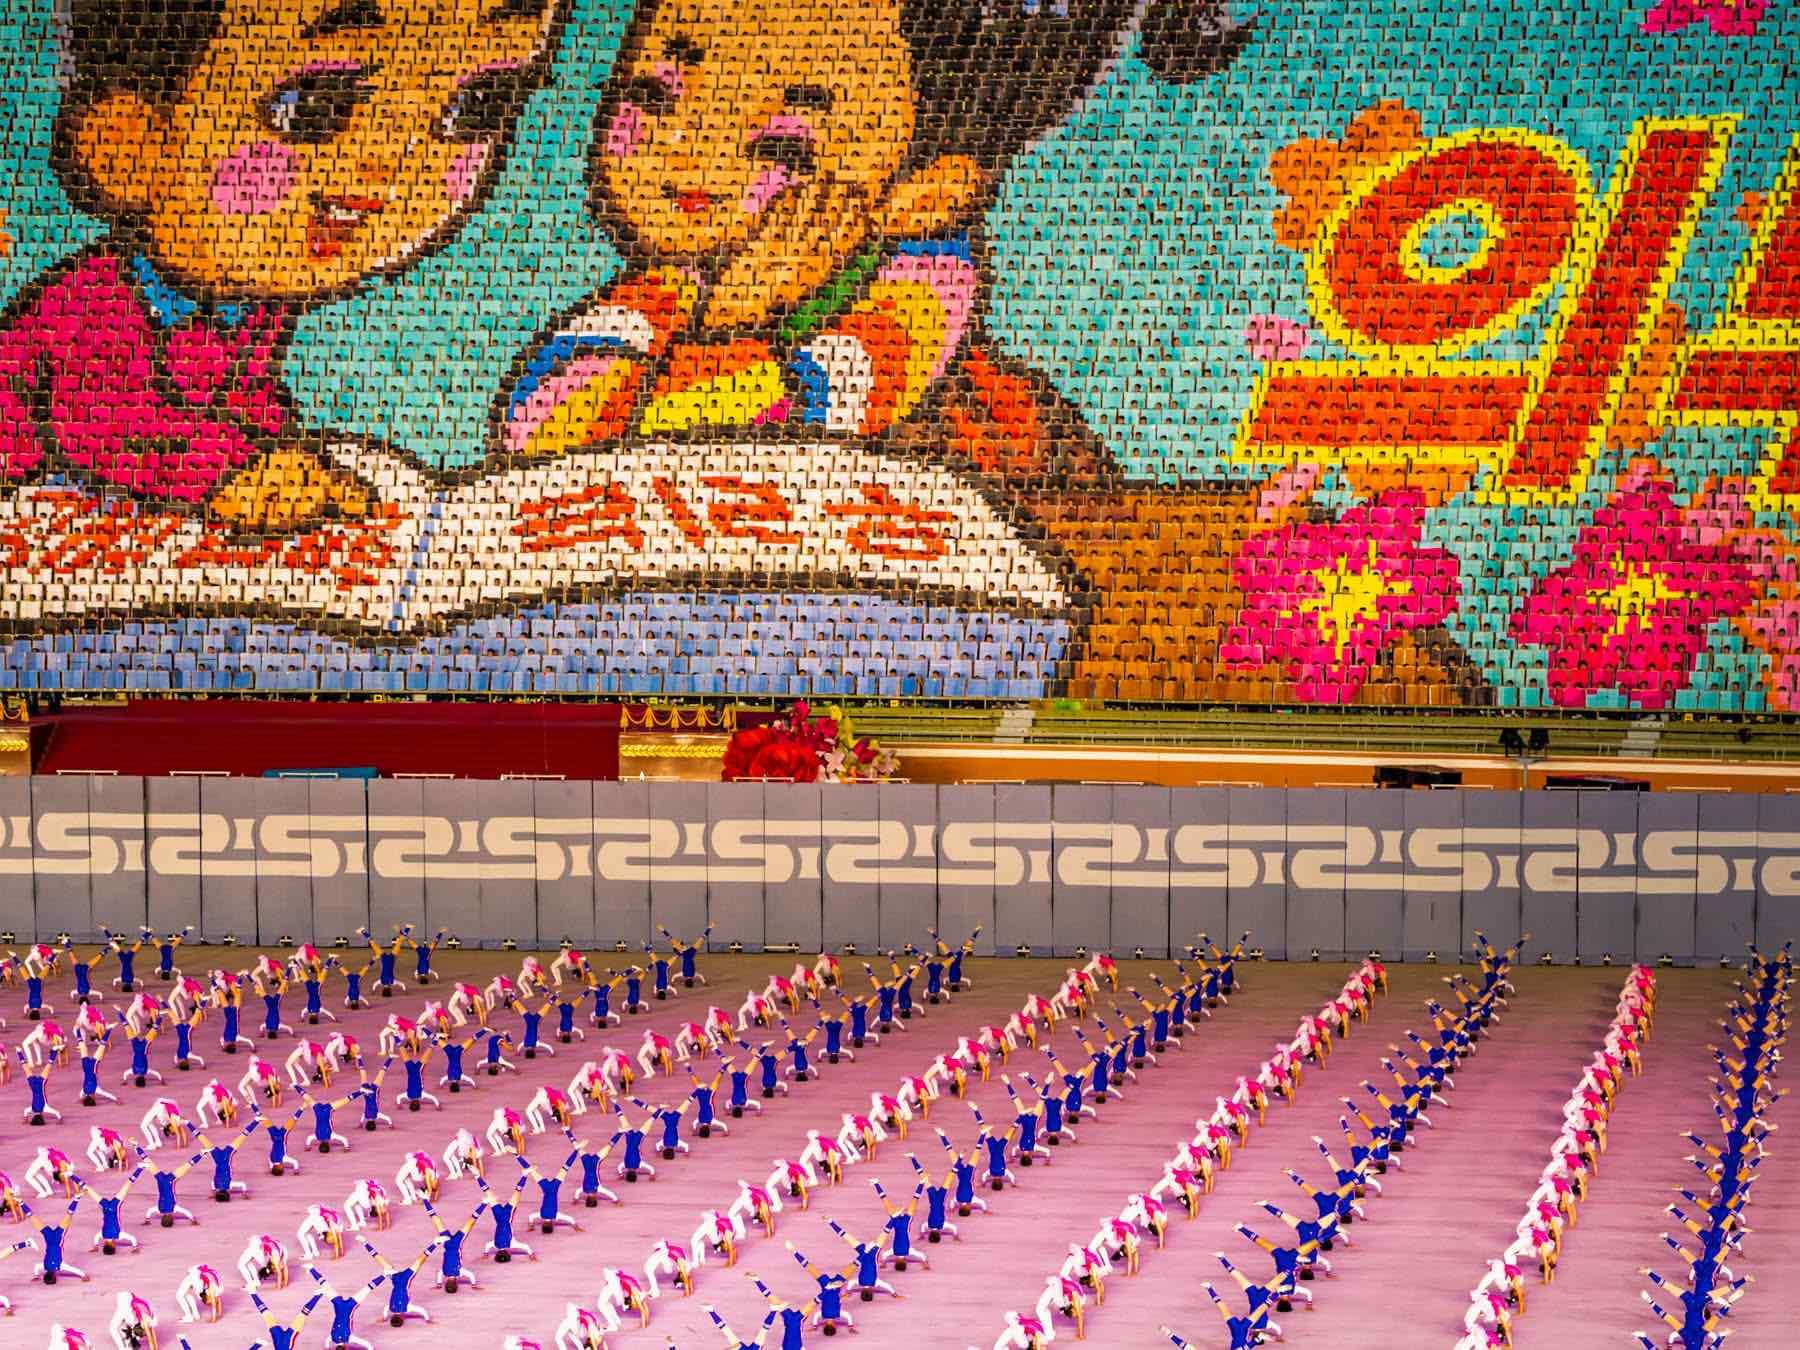 En lydmur i Nordkorea